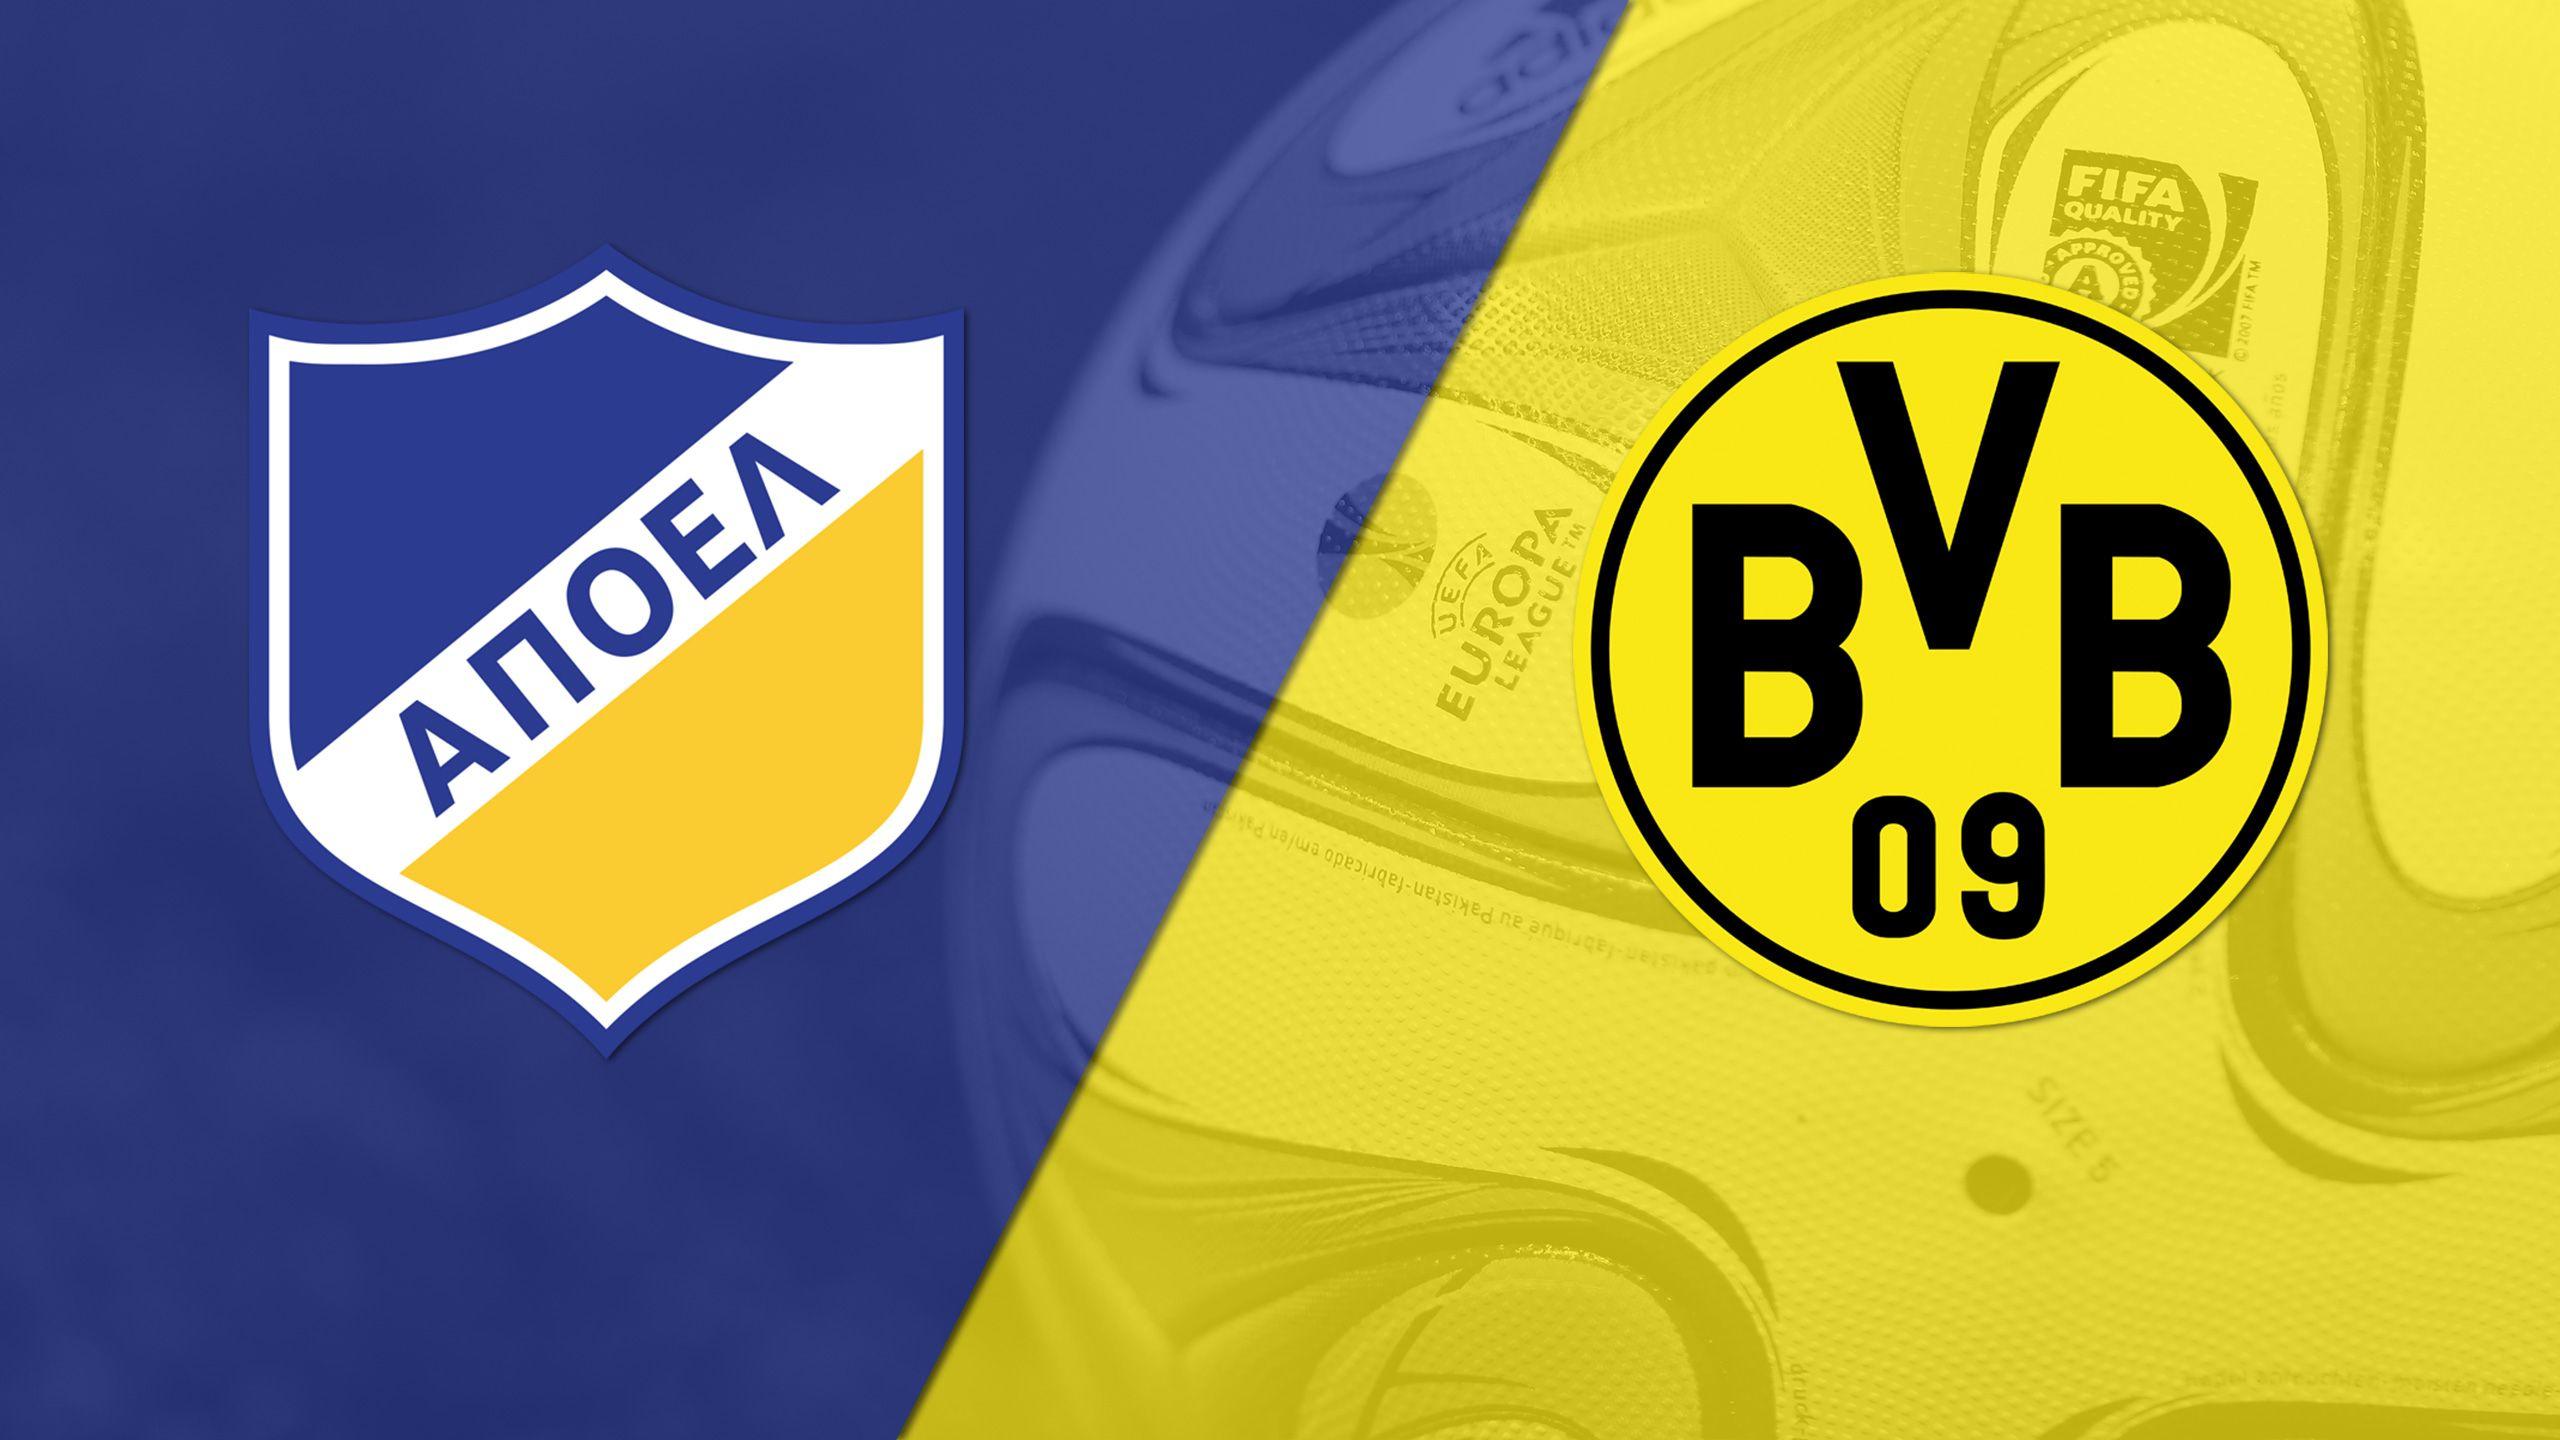 APOEL vs. Borussia Dortmund (Group Stage #3) (UEFA Champions League)